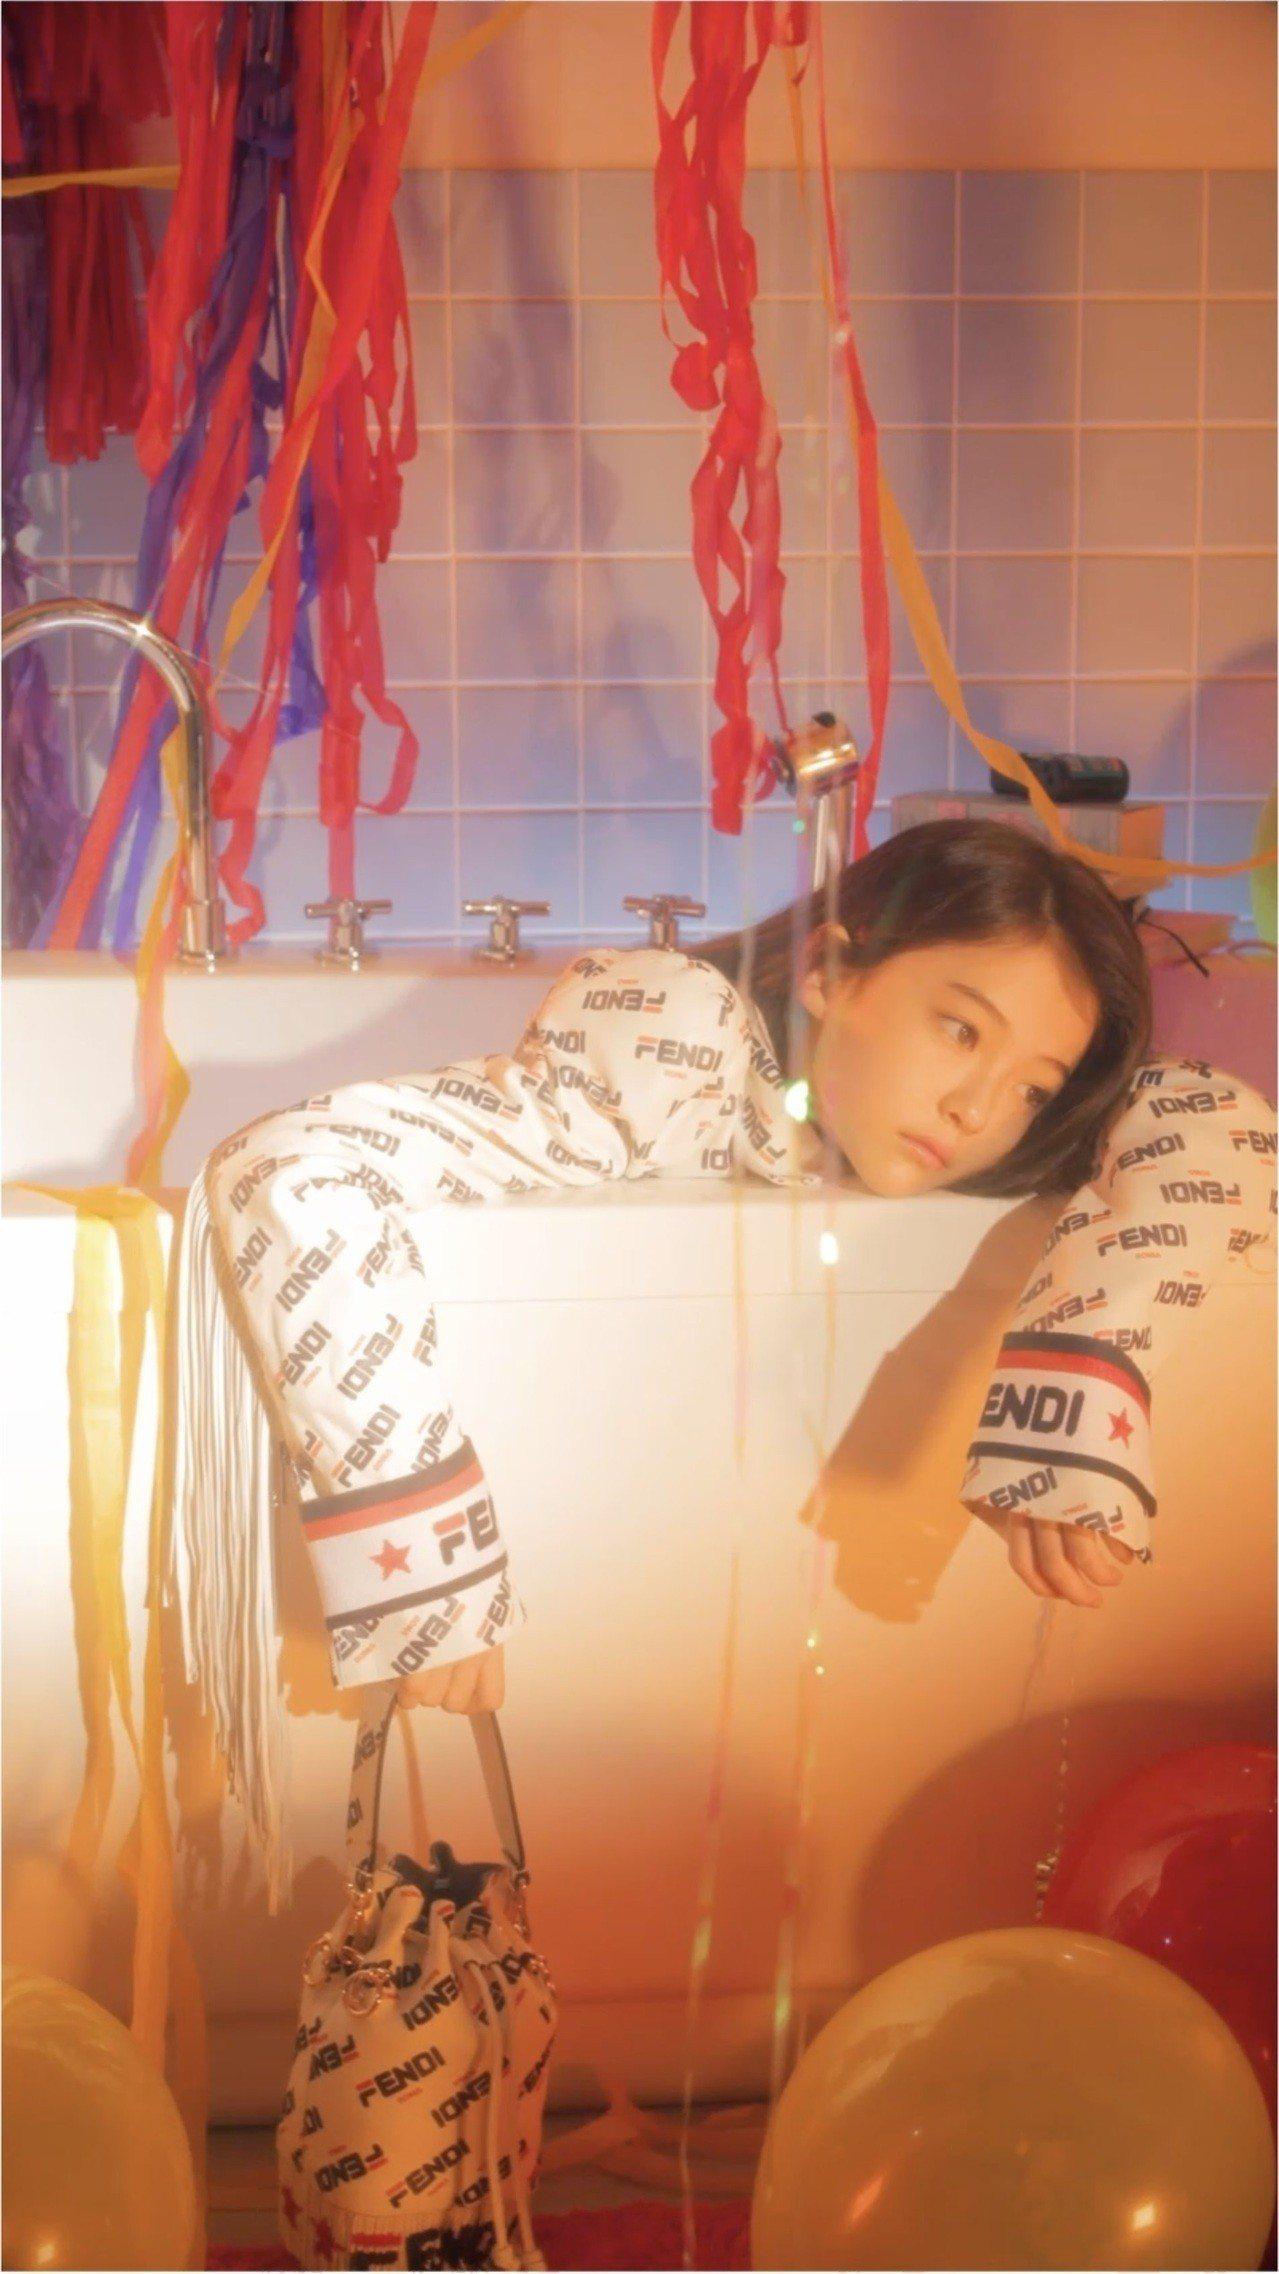 Ella Gross詮釋Mania系列,拍出超模的神采。圖/FENDI提供